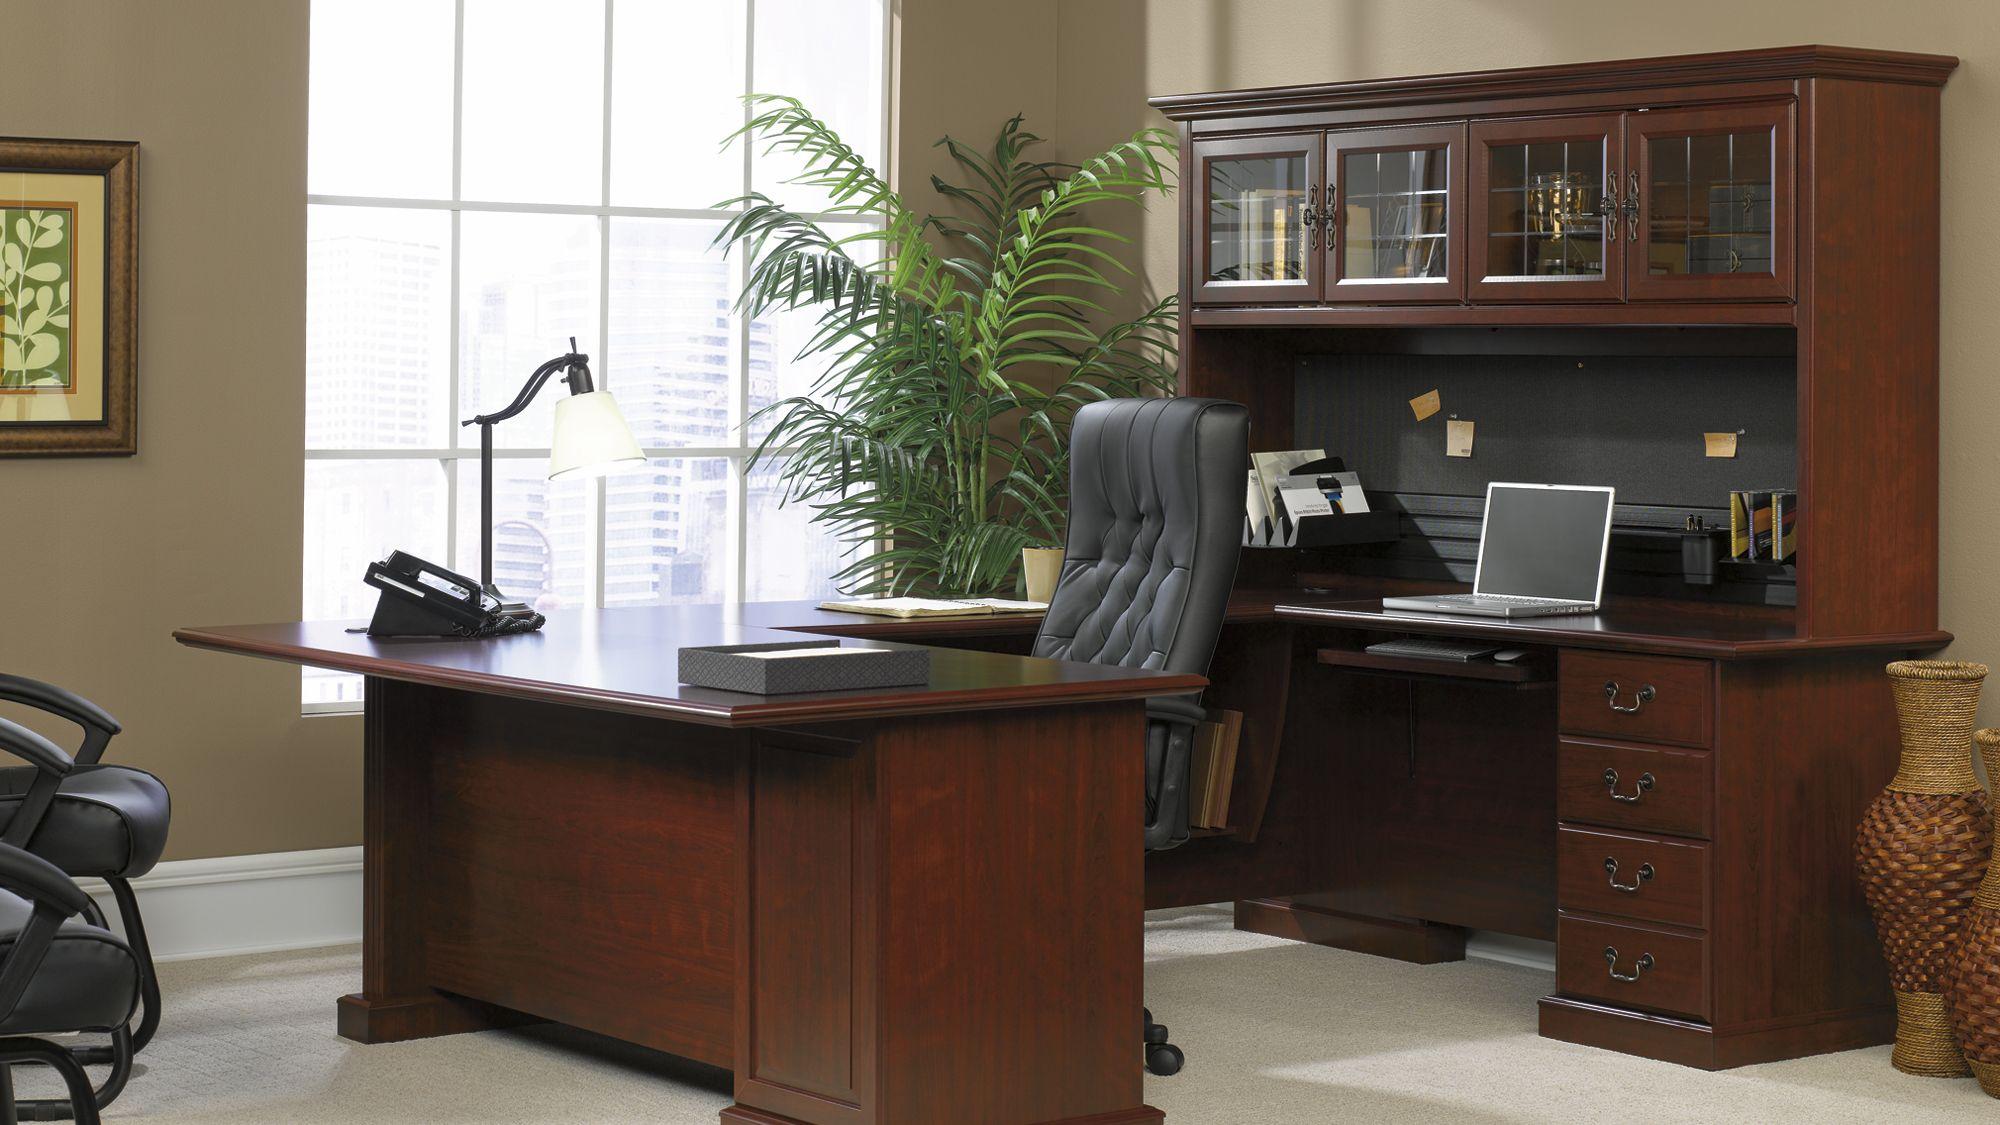 heritage hill collection bookshelves home office desks